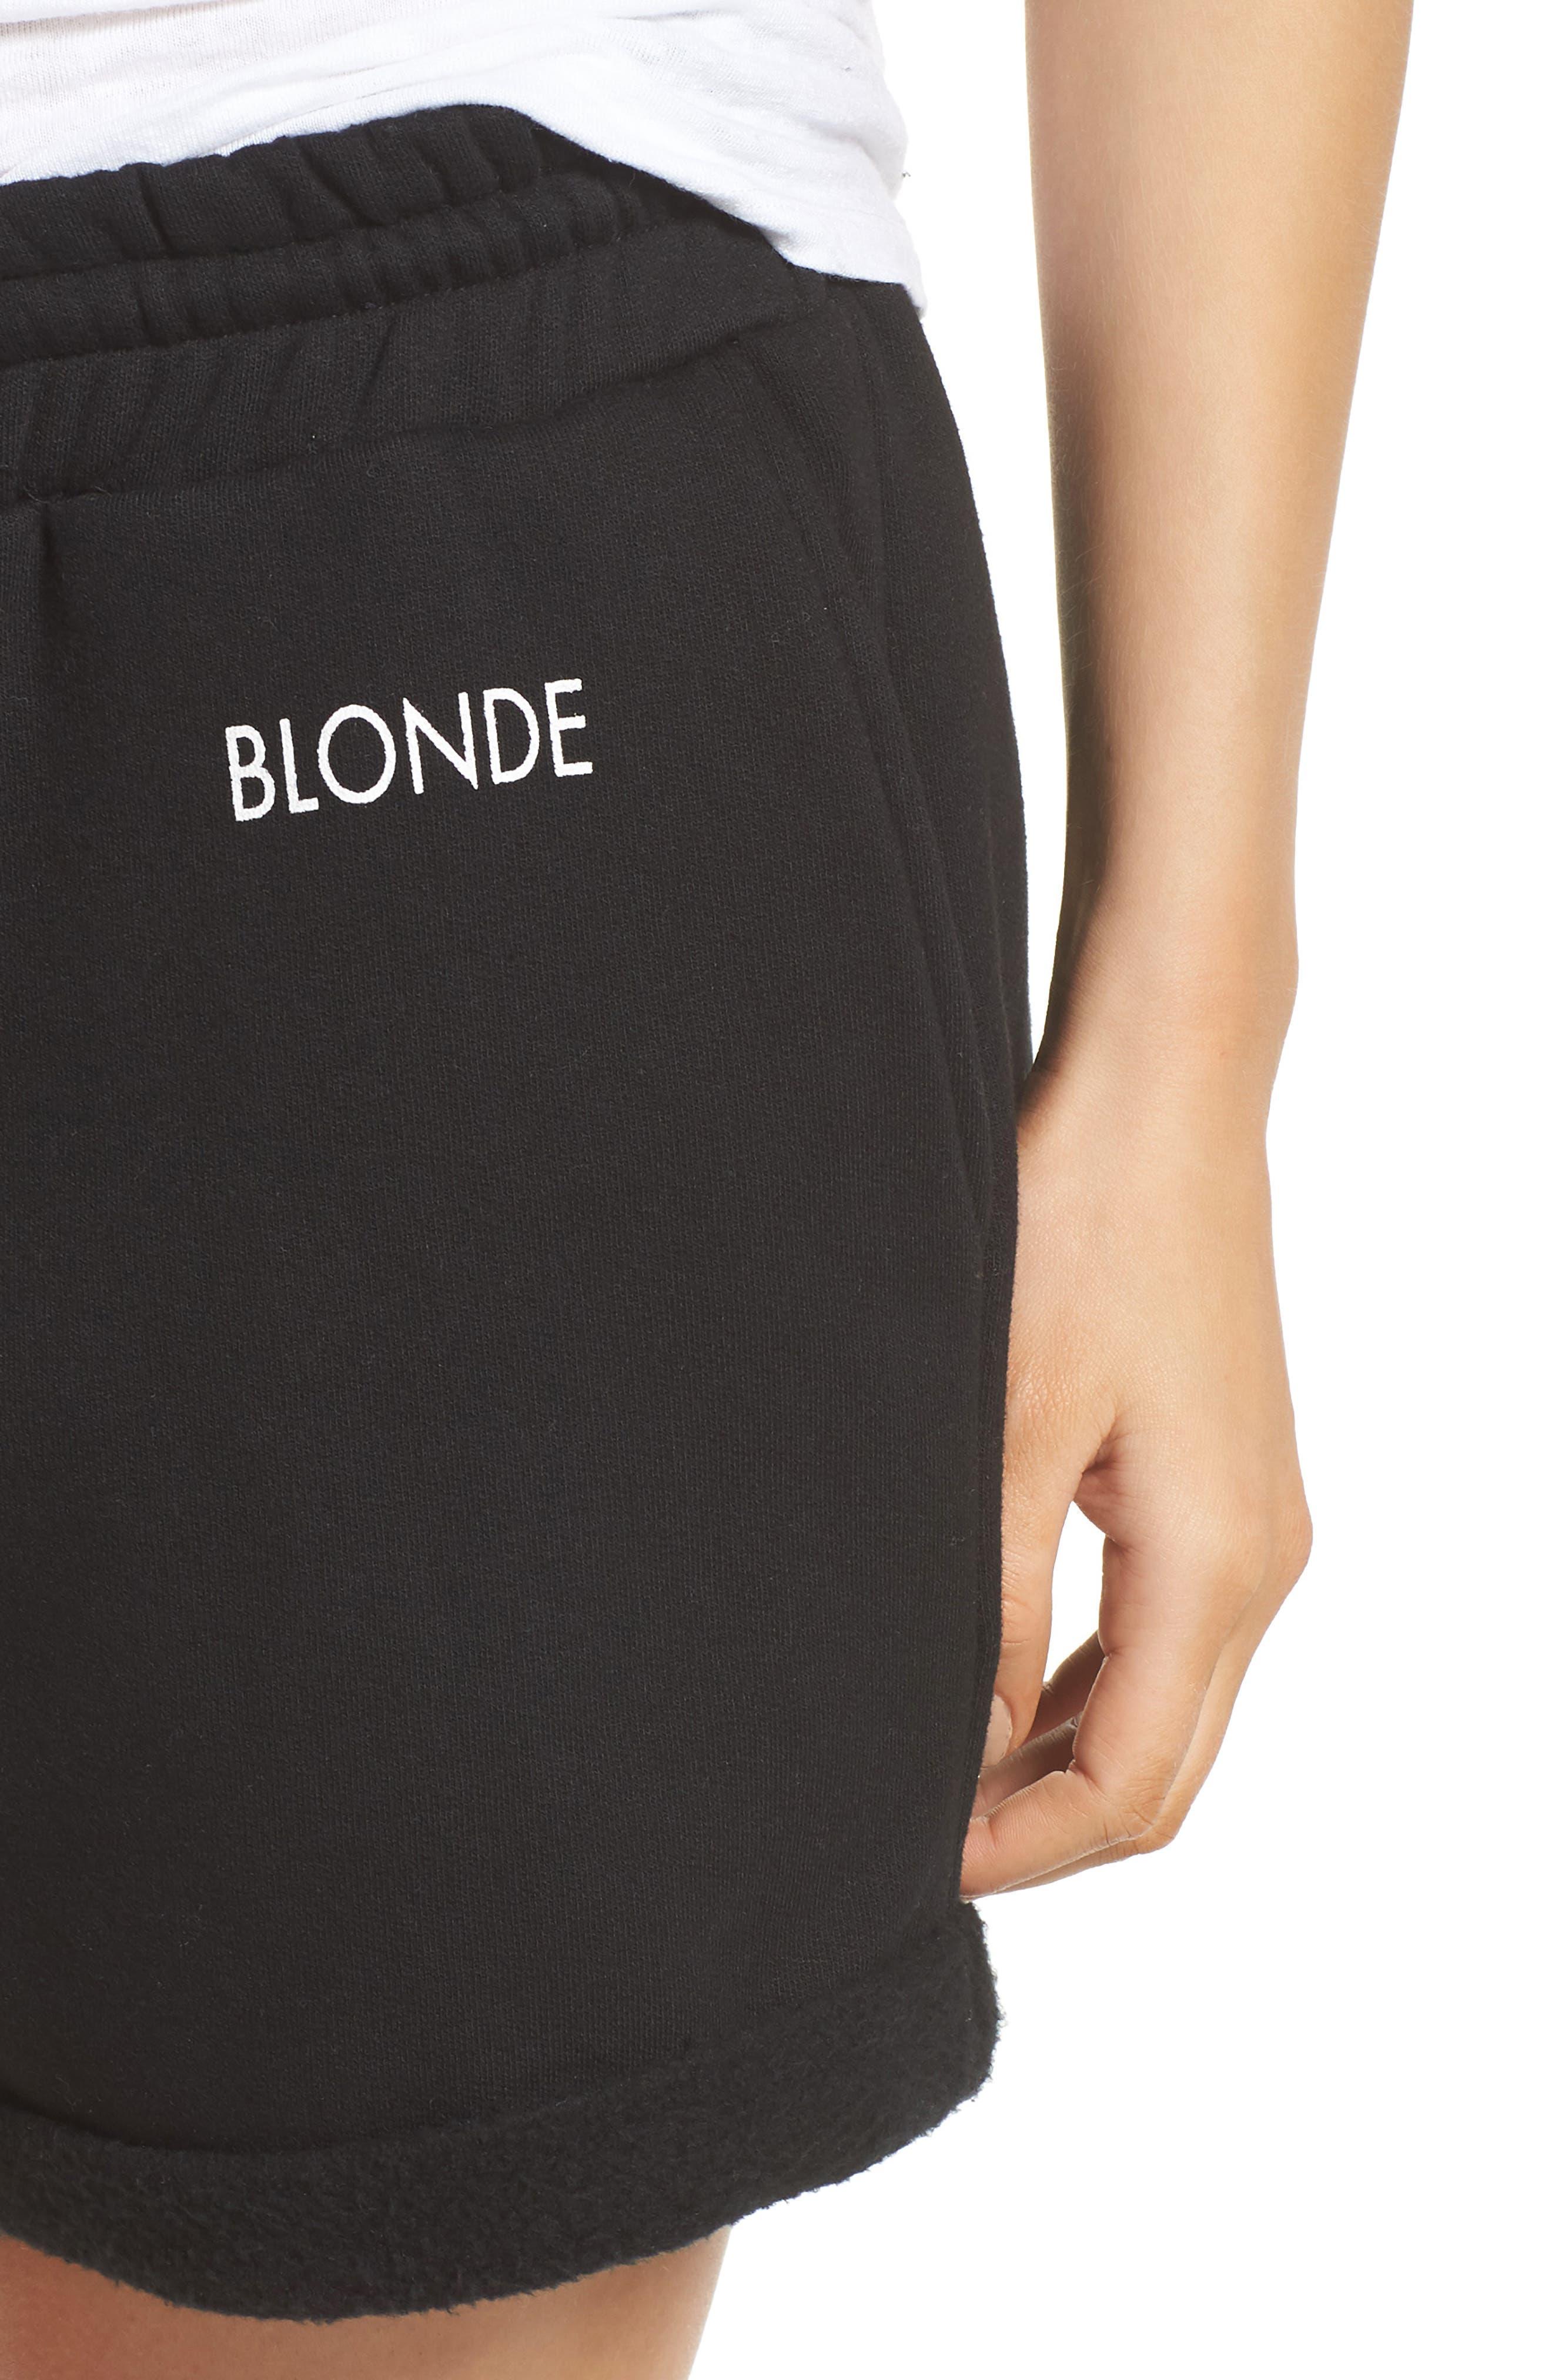 Blonde Lounge Shorts,                             Alternate thumbnail 4, color,                             008